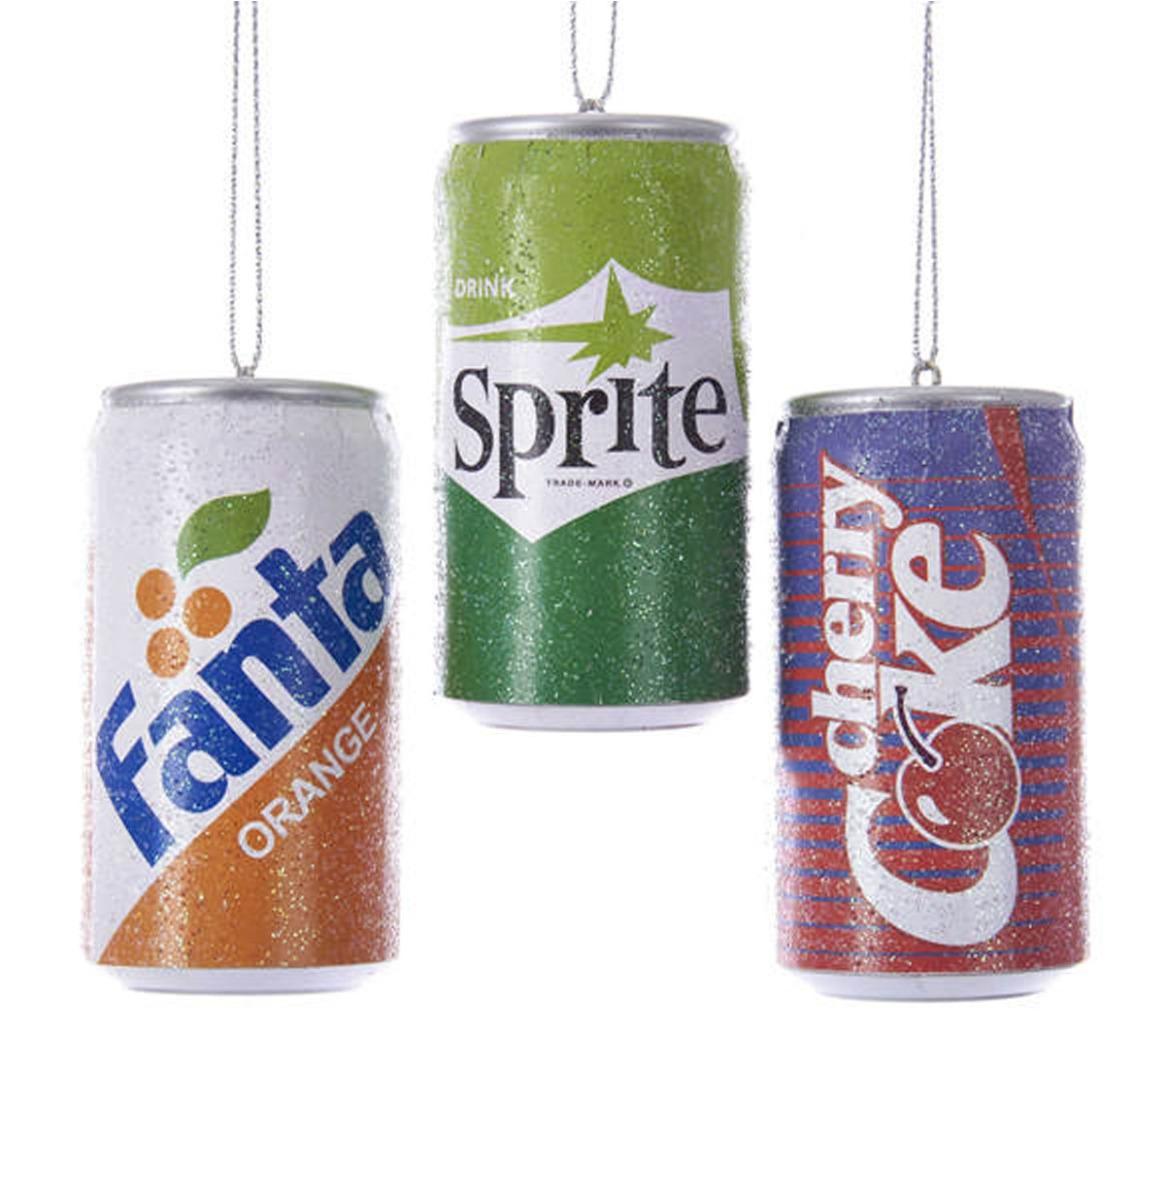 Fanta, Sprite & Cherry Coke Plastic Frisdrank Blikjes Kerst Ornamenten - Set Van 3